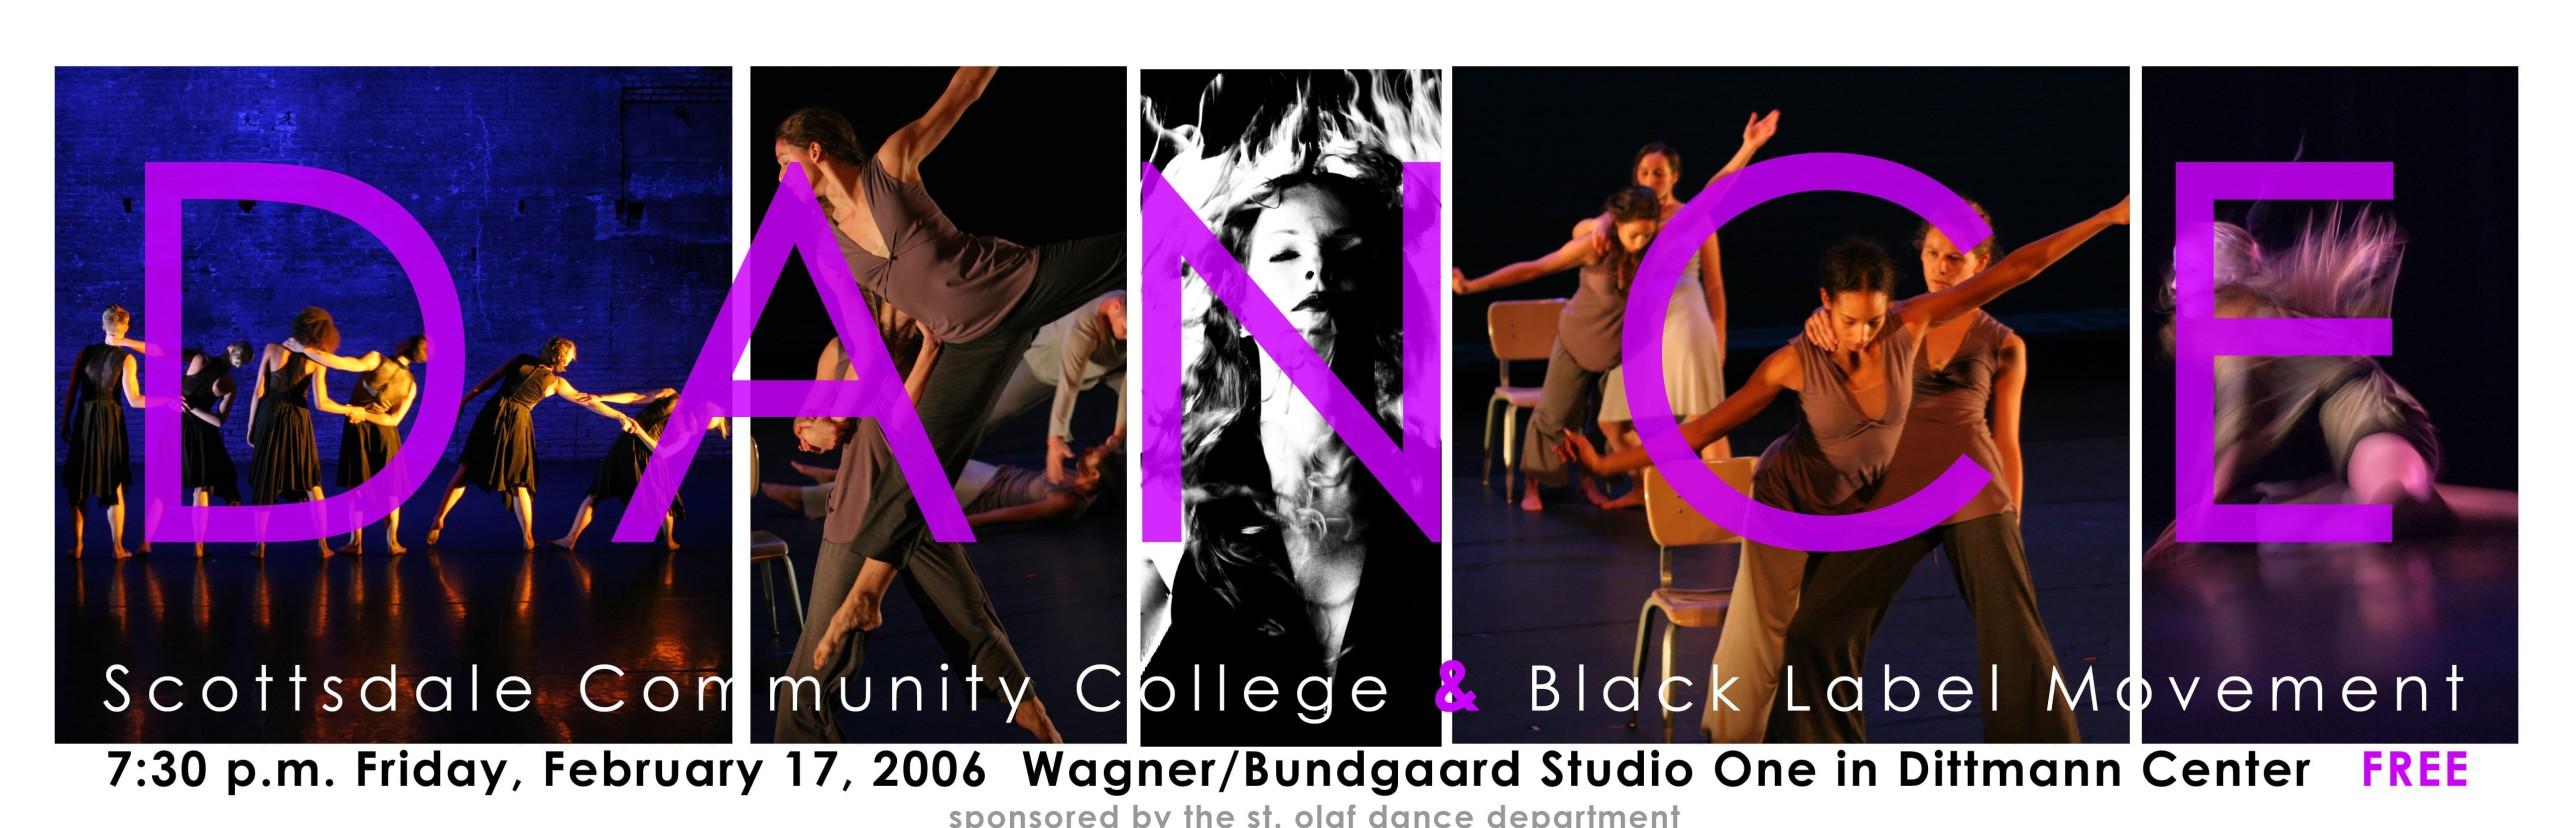 2005-06_dance_ga_blm_Poster-min